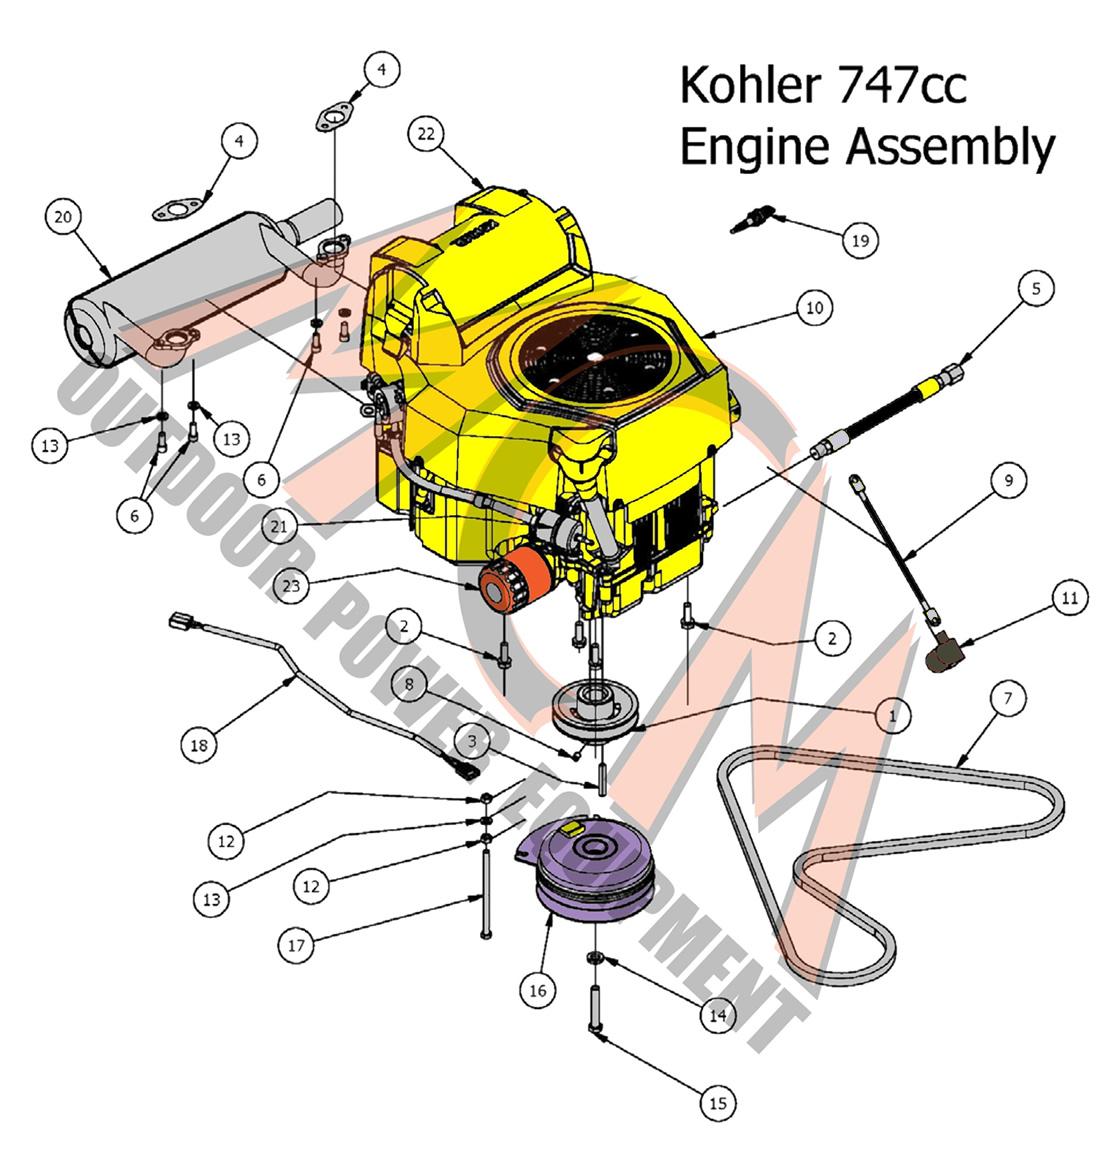 Bad Boy Mower Part  2017 Maverick Kohler 747cc Engine